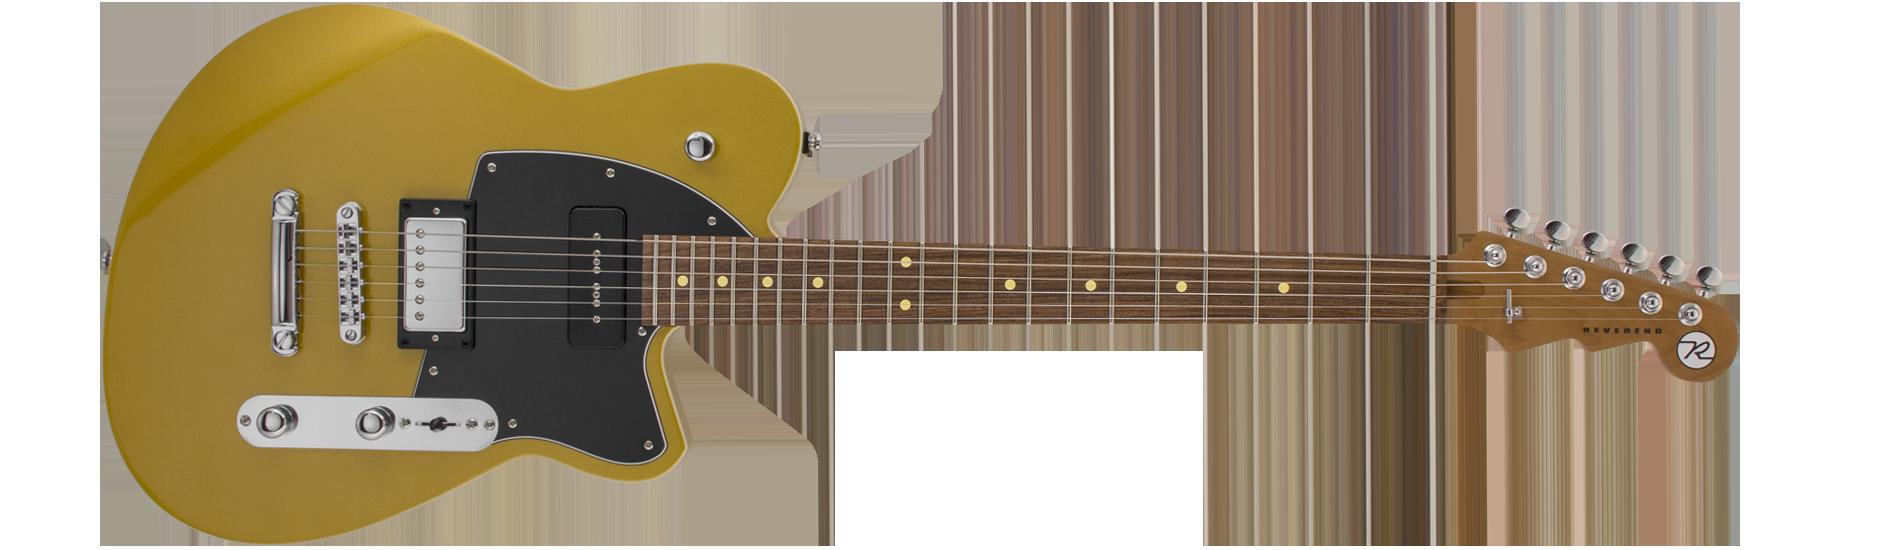 Reverend Guitars Double Agent Og Single Coil 2 Volume Pots No Switch Telecaster Guitar Forum Venetian Gold